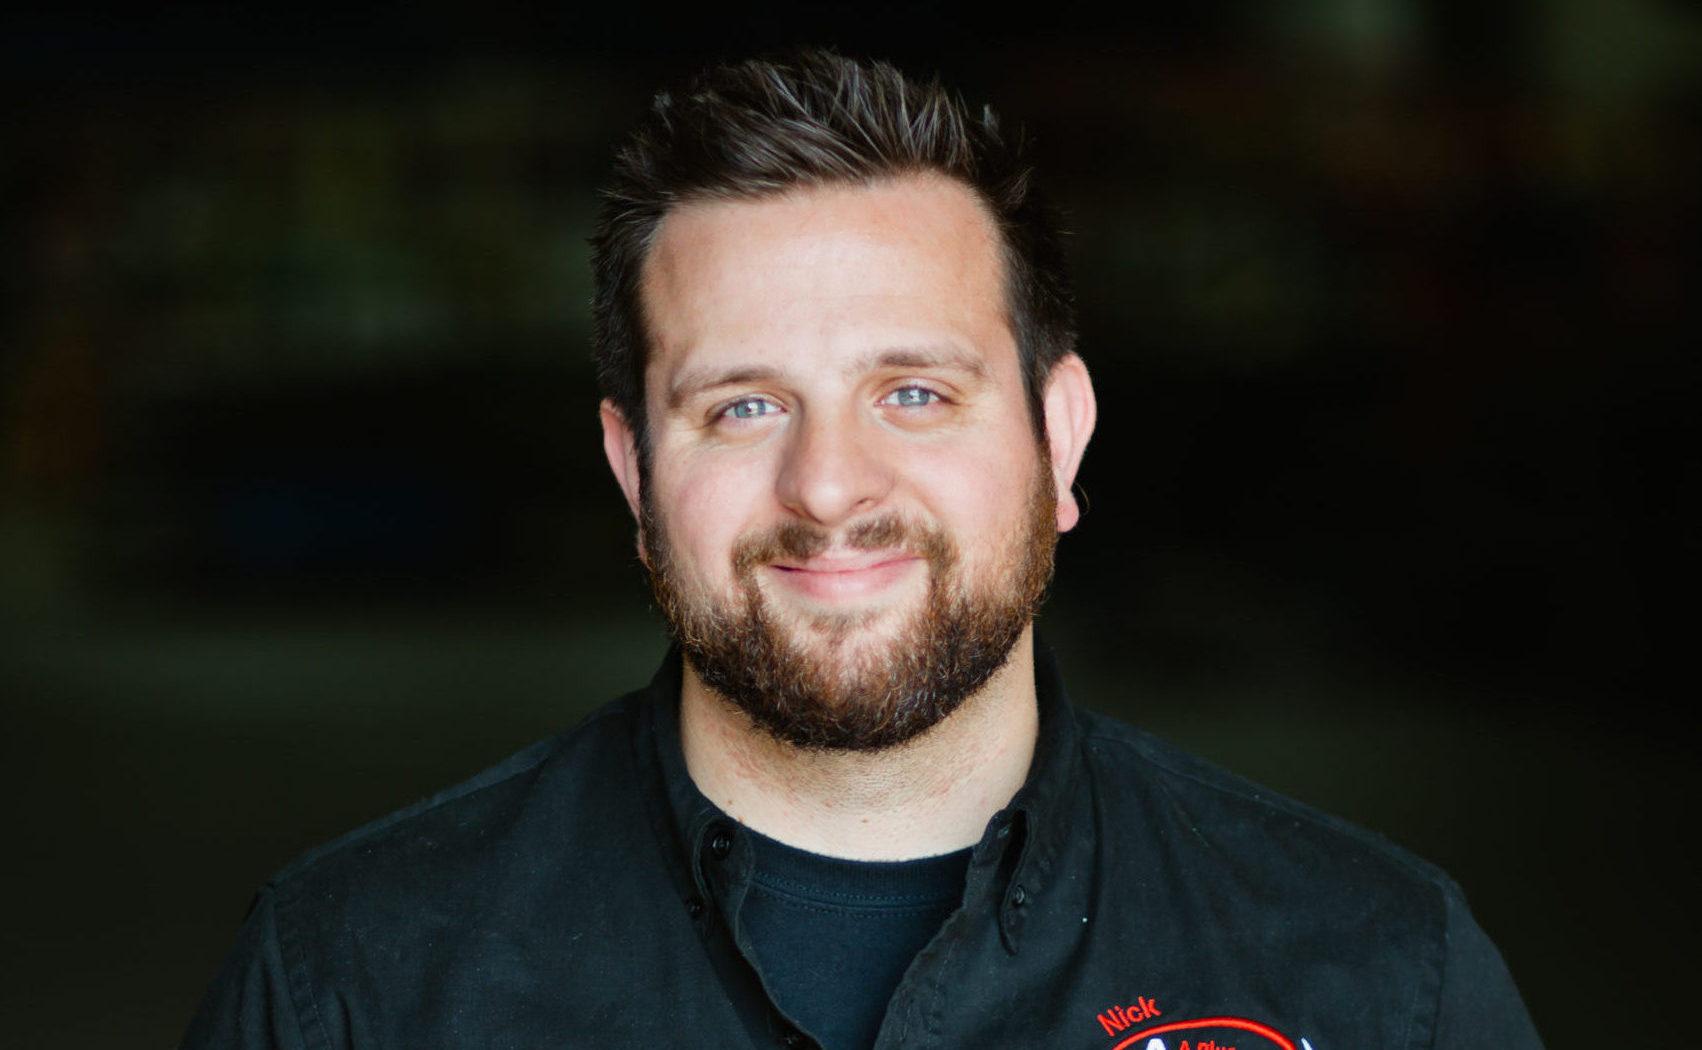 Nick Sukosd – Operations Manager